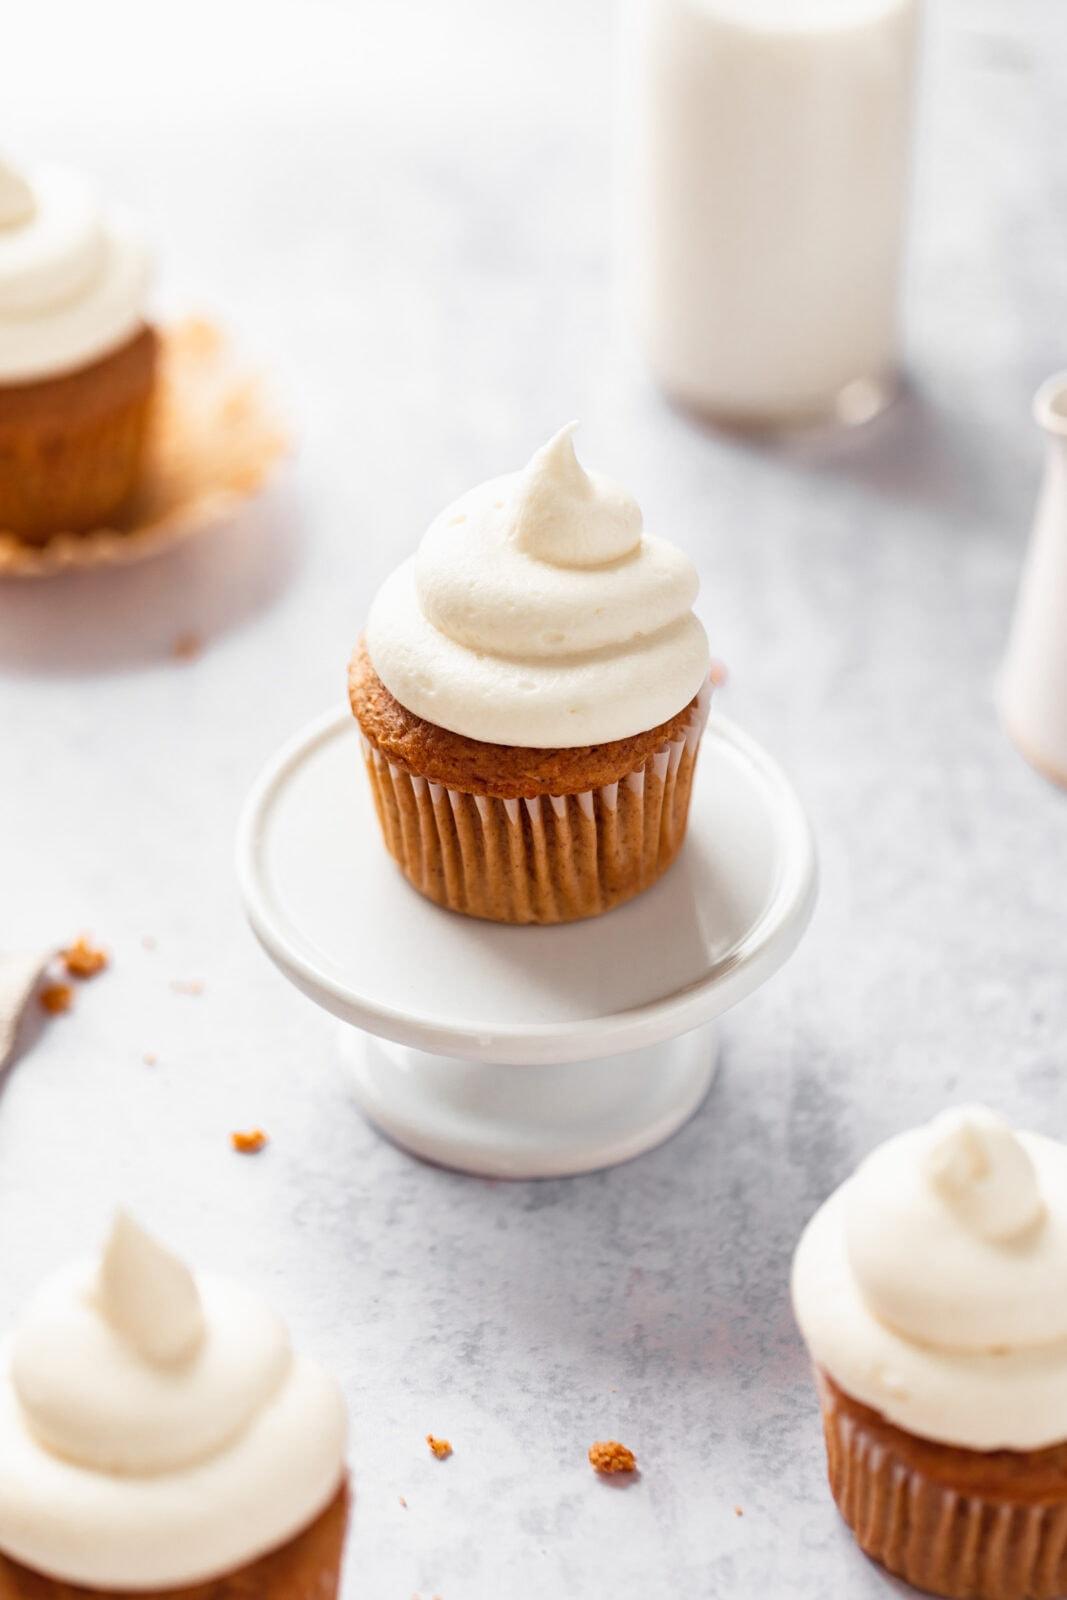 carrot cake cupcake on a cake stand